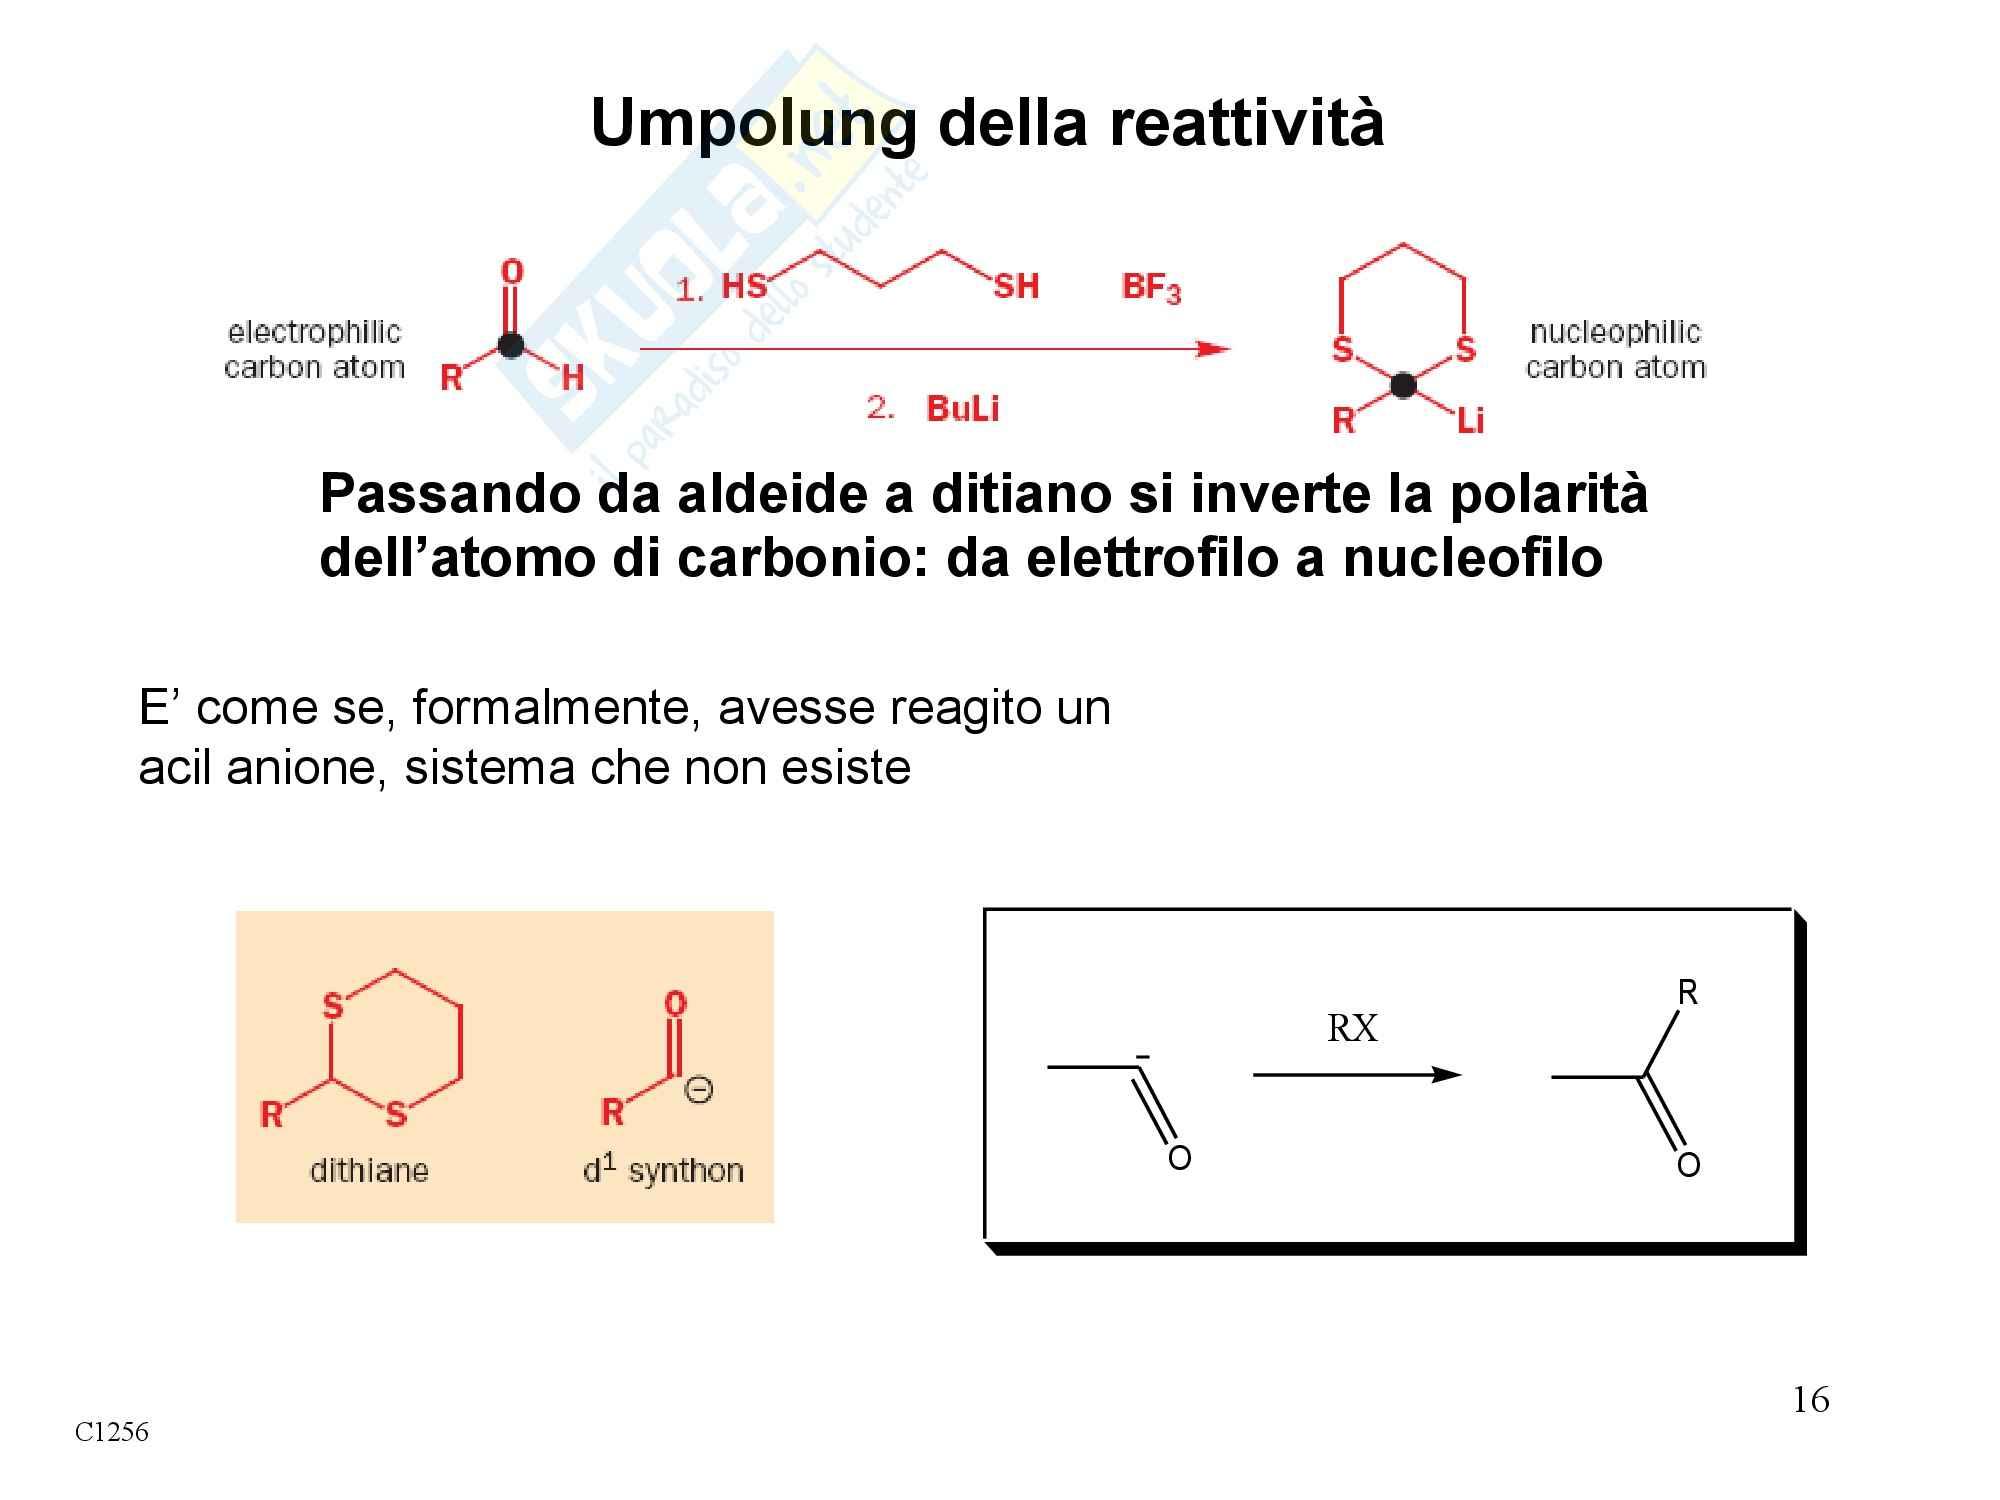 Chimica organica - composti eterocicli Pag. 16